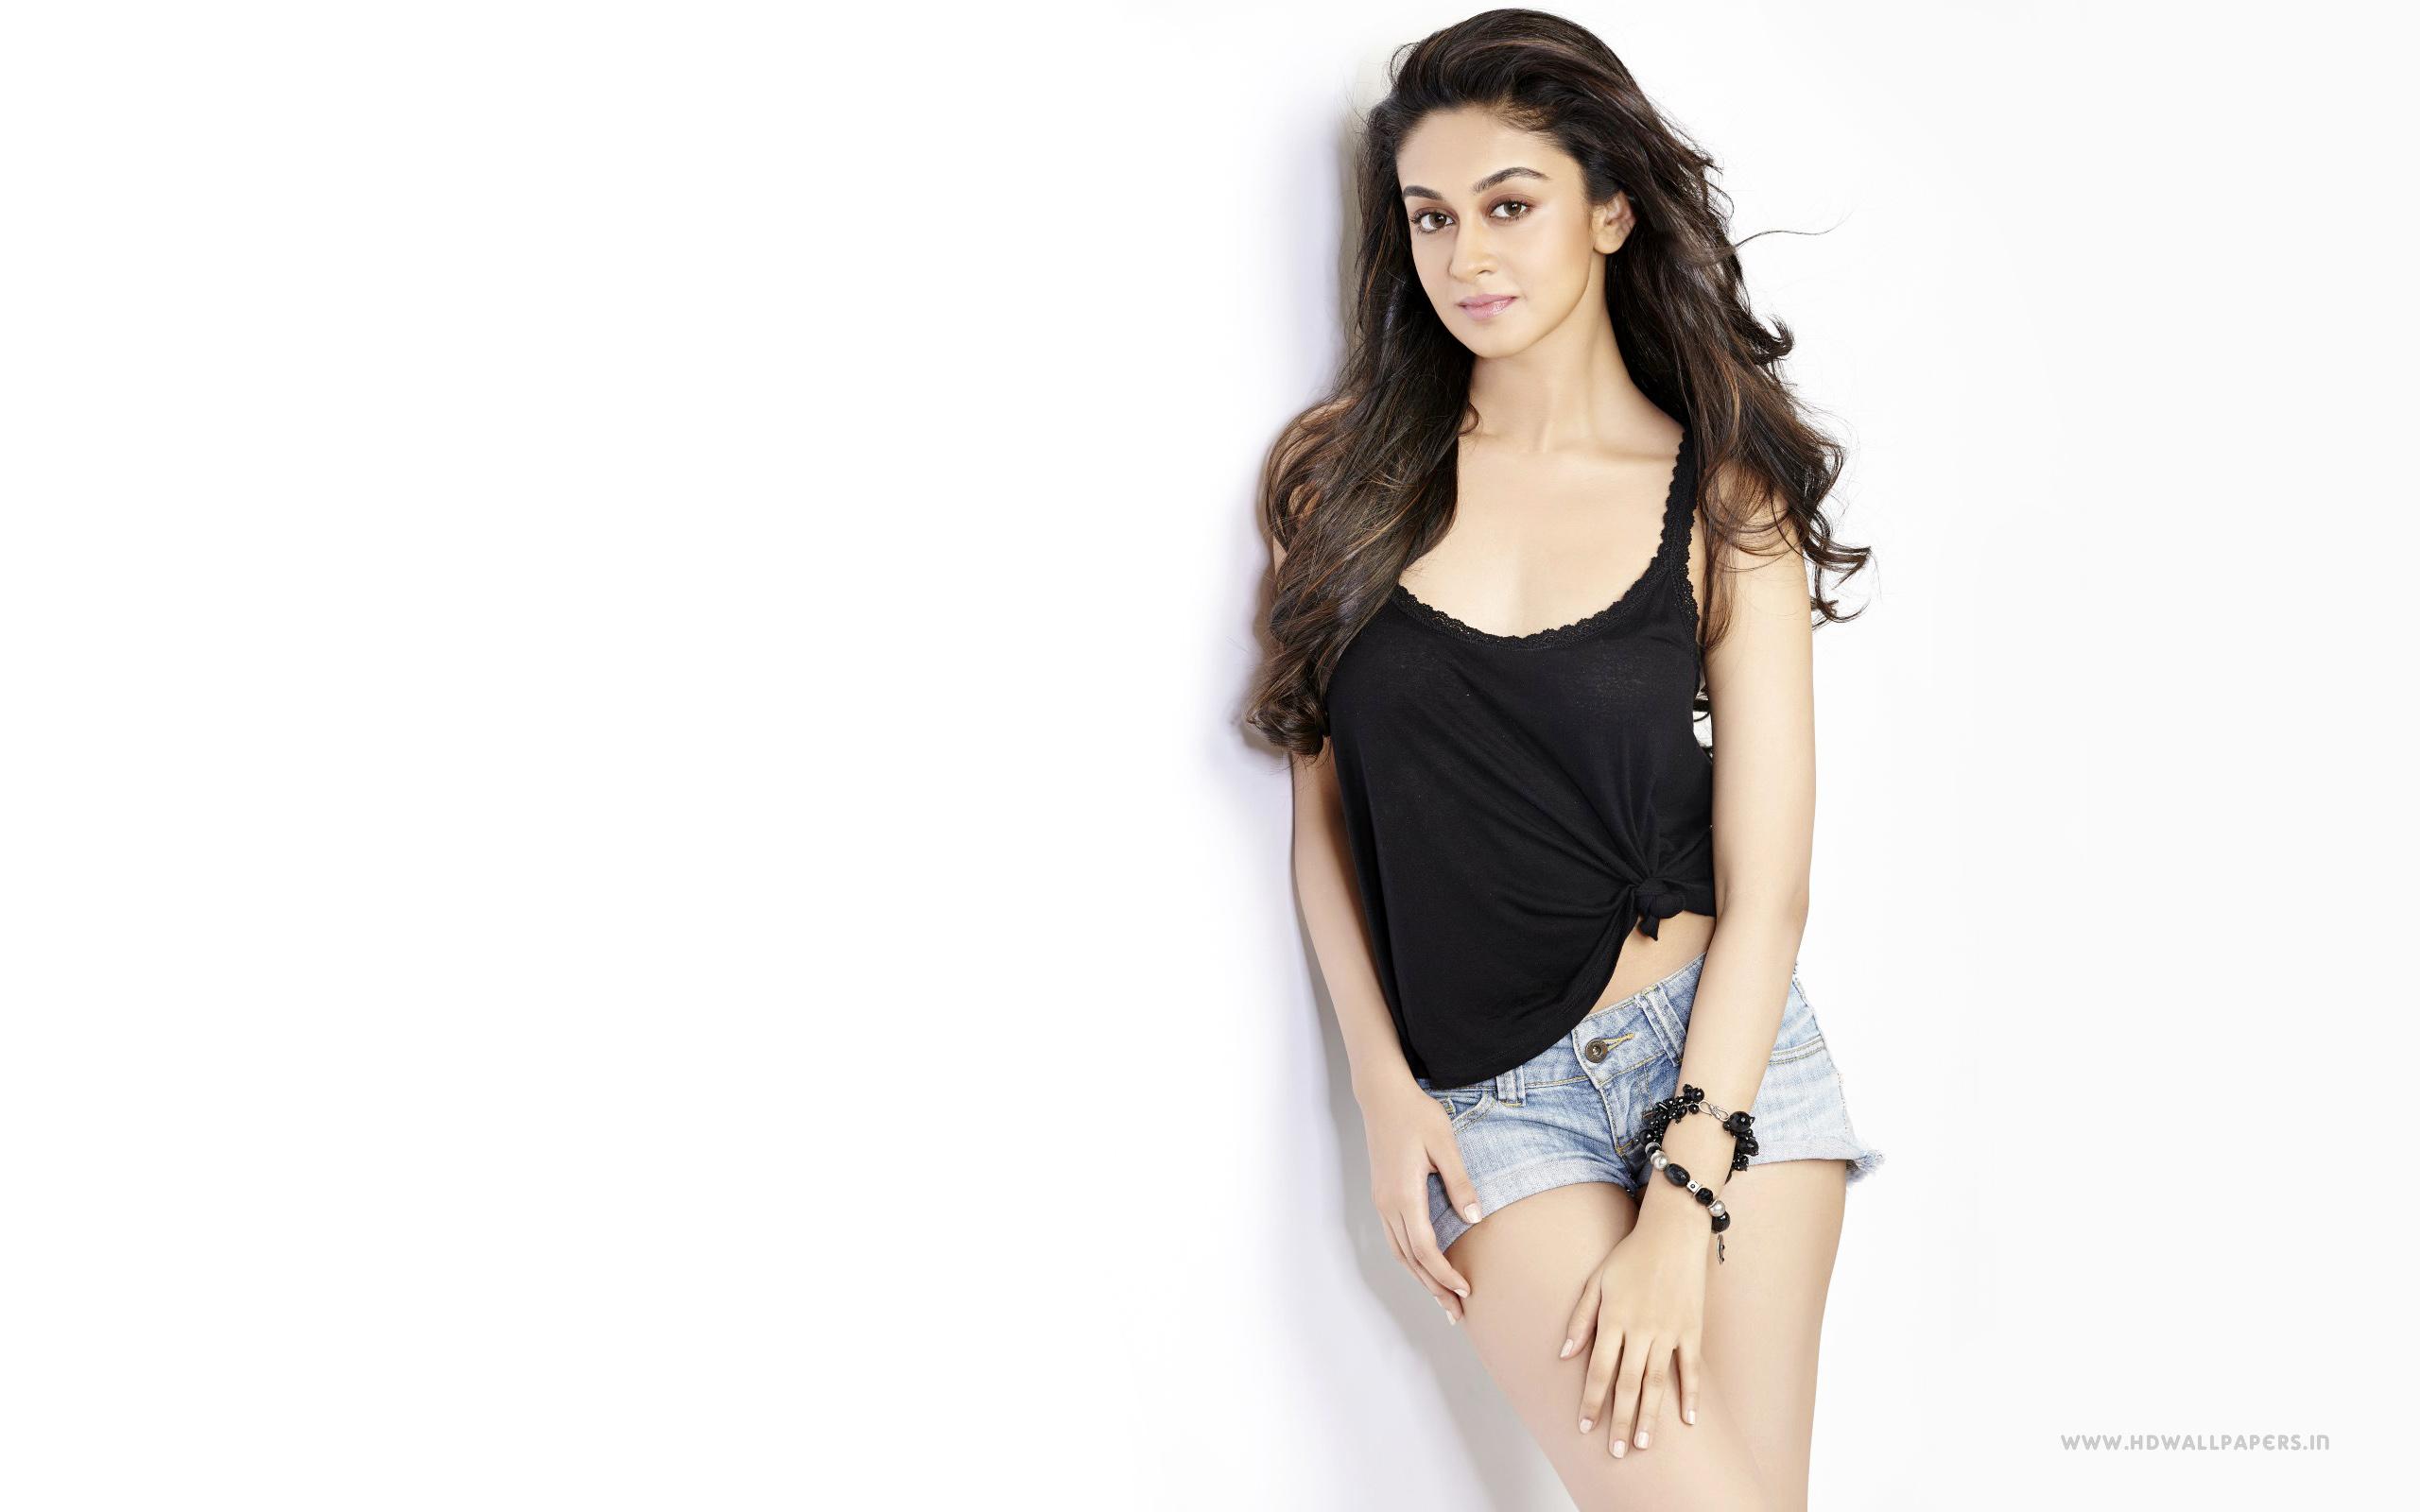 Aishwarya Arjun hot images in tights